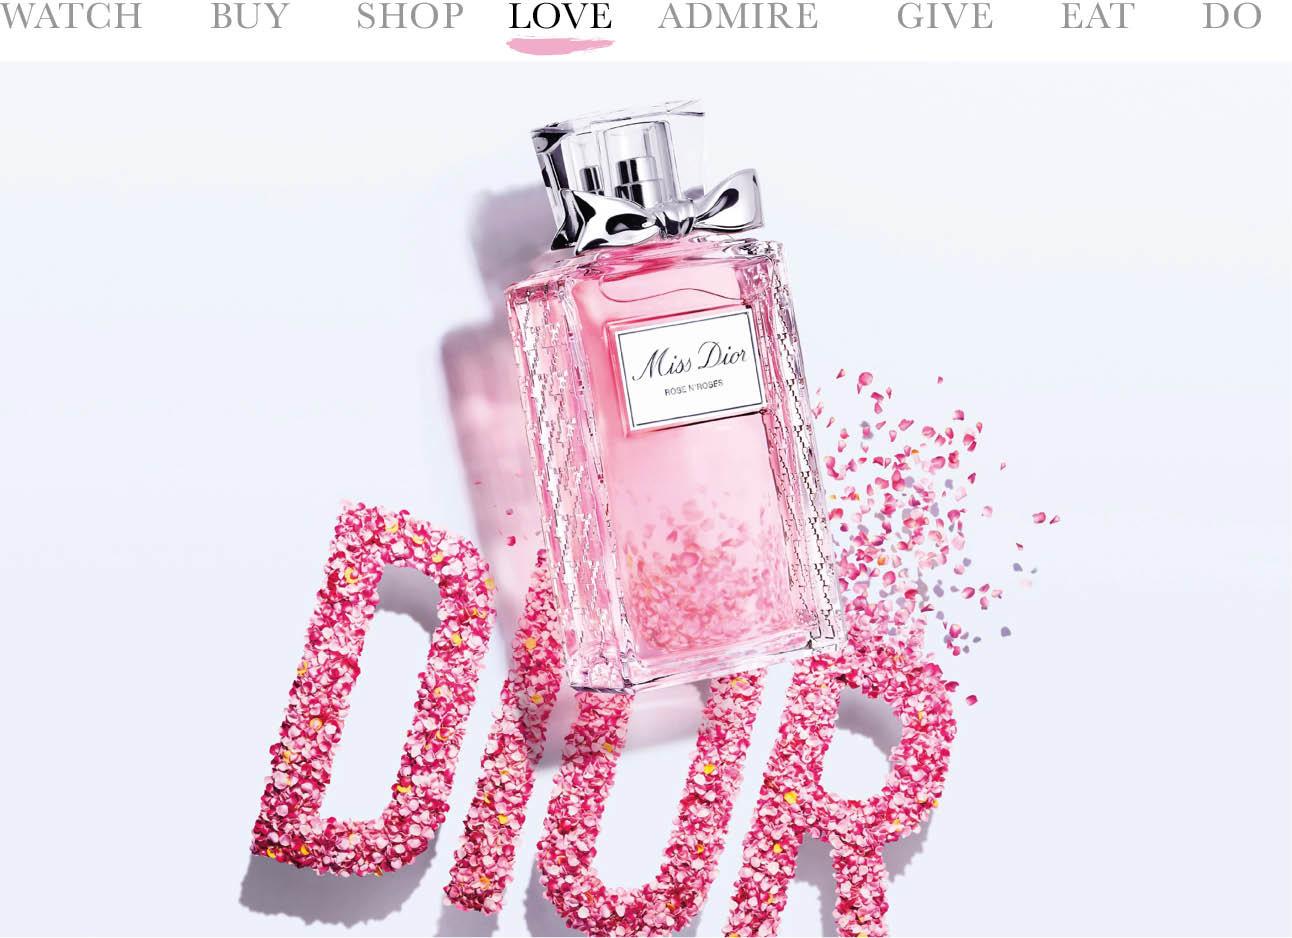 Parfumfles miss dior met bloemblaadjes